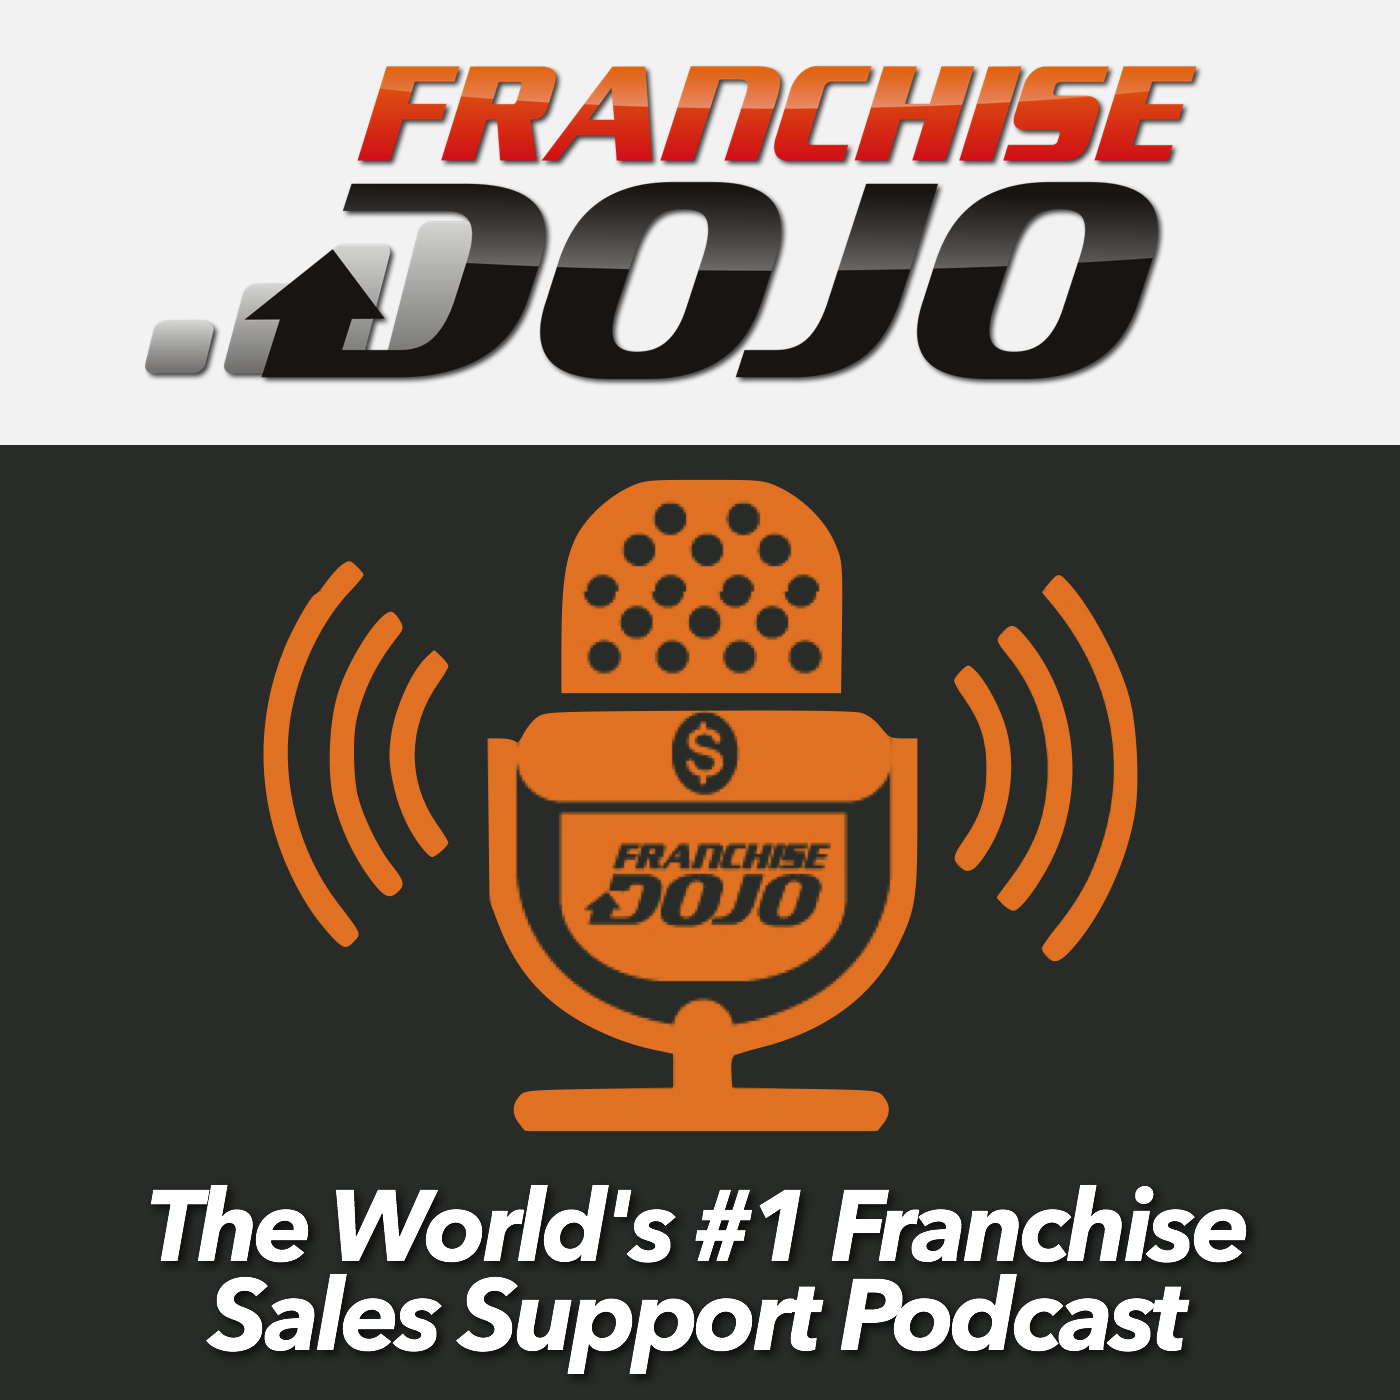 Franchise Dojo - Weekly Franchise Sales Support